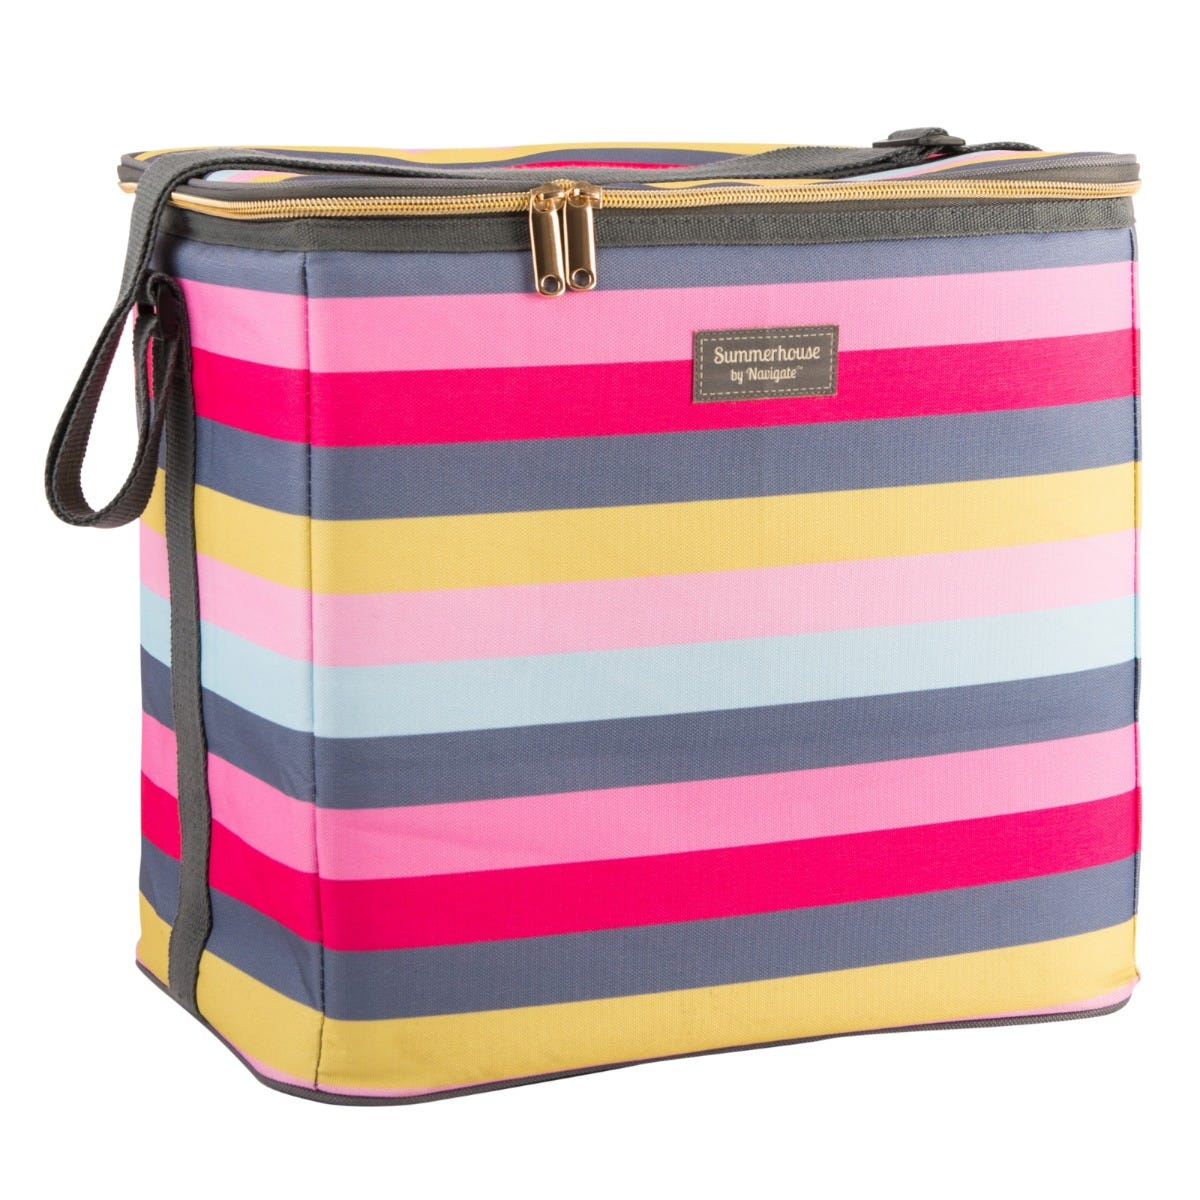 Summerhouse Gardenia Stripe 20L Family Cool Bag - Multi-coloured